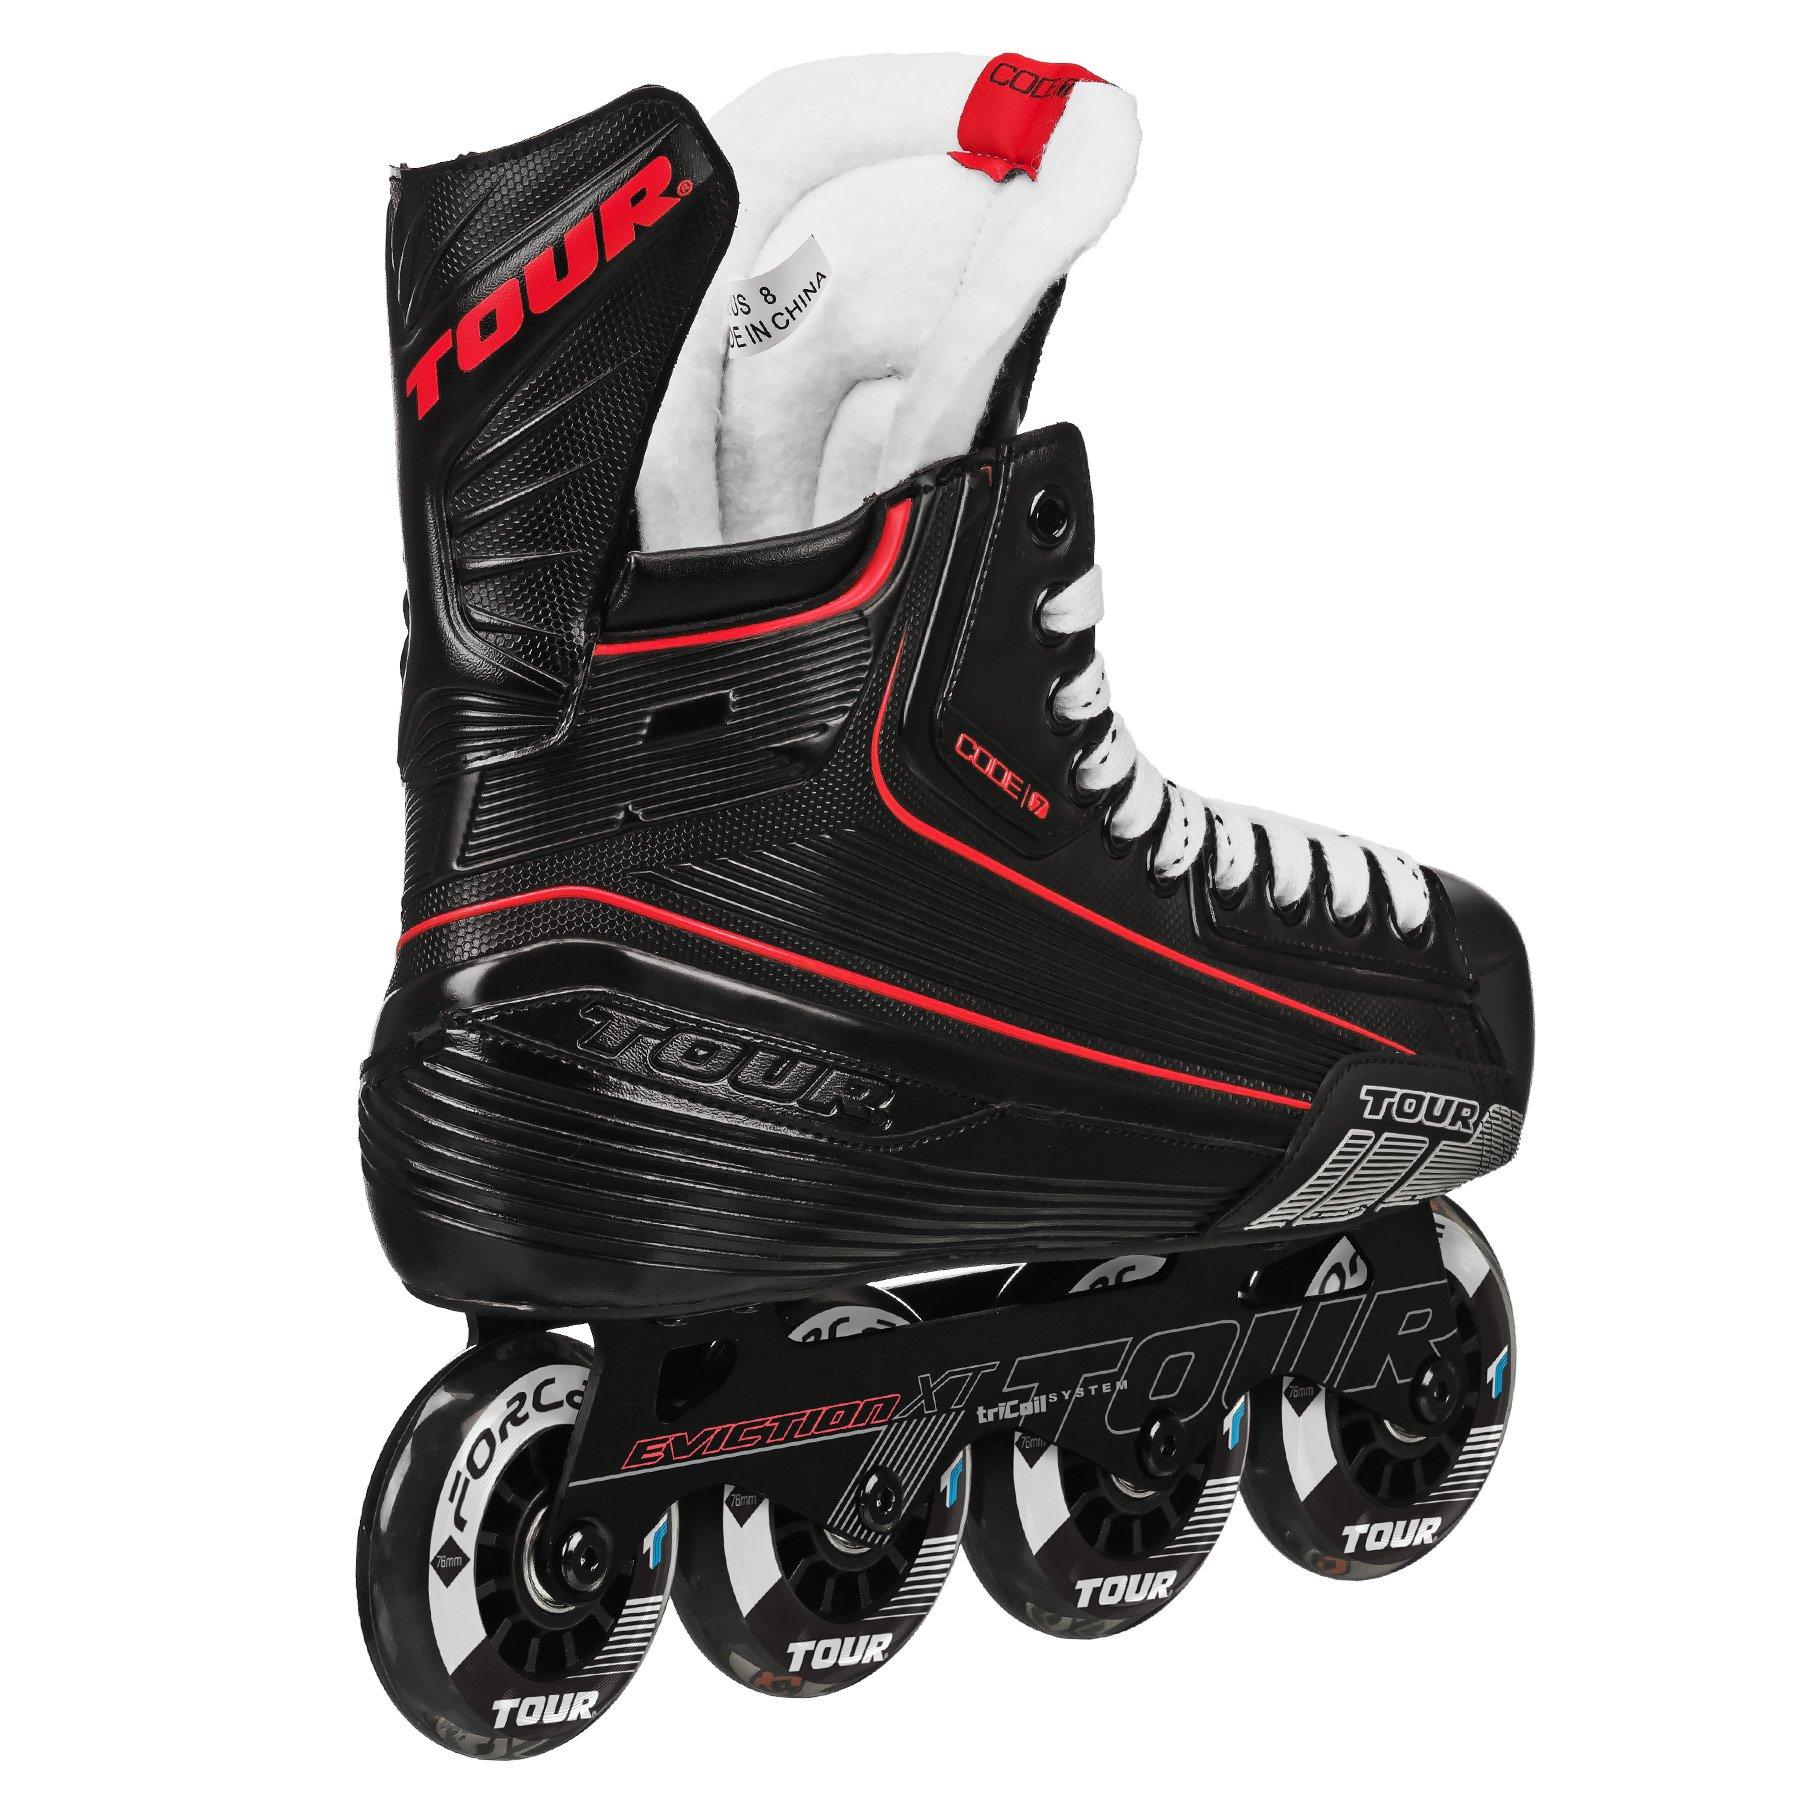 Tour Hockey Code 7 Junior Inline Hockey Skate, Black, 01 by Tour Hockey (Image #3)